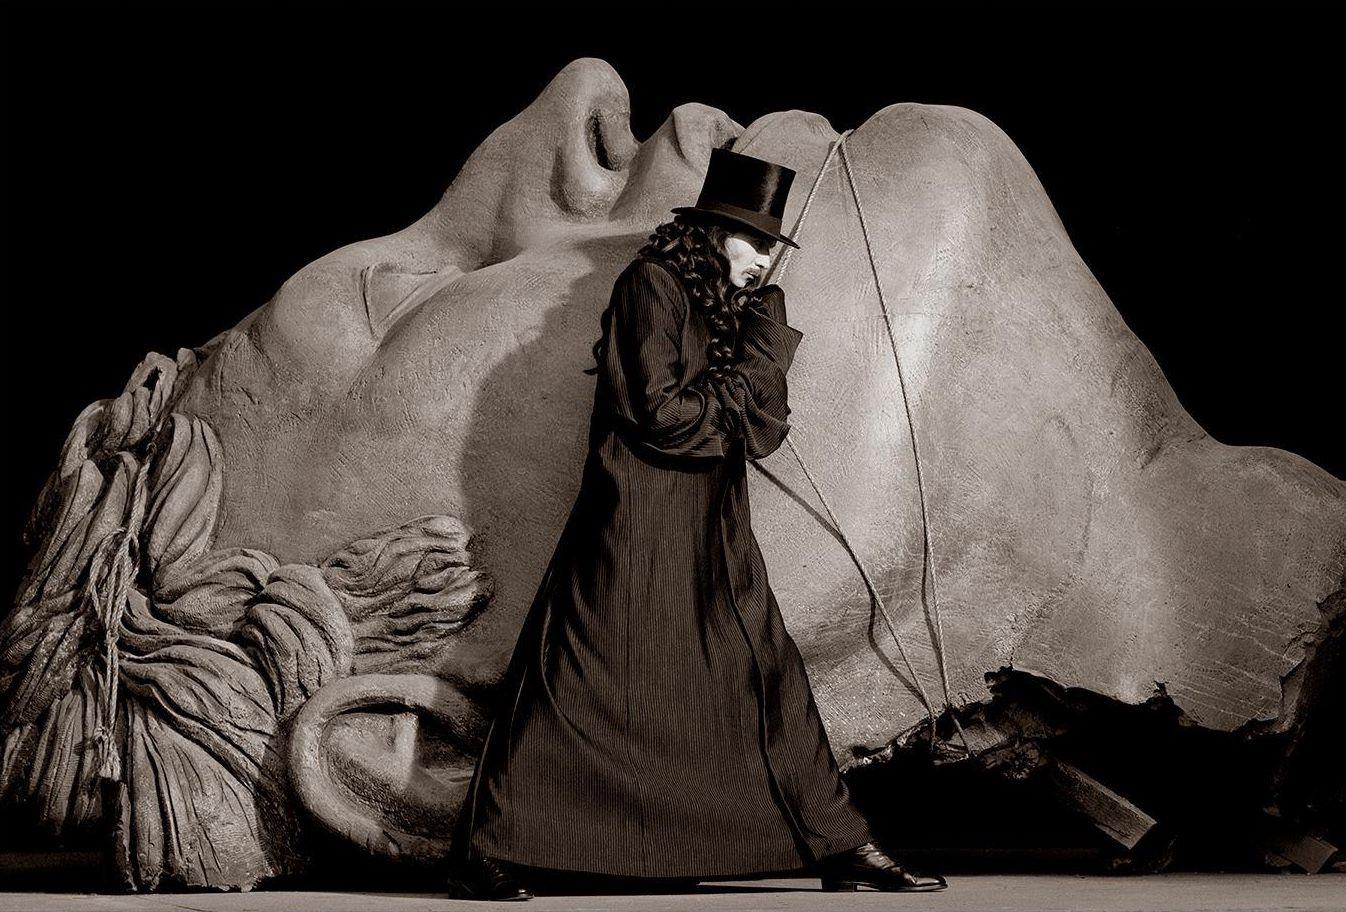 Gary Oldman as Dracula - Two